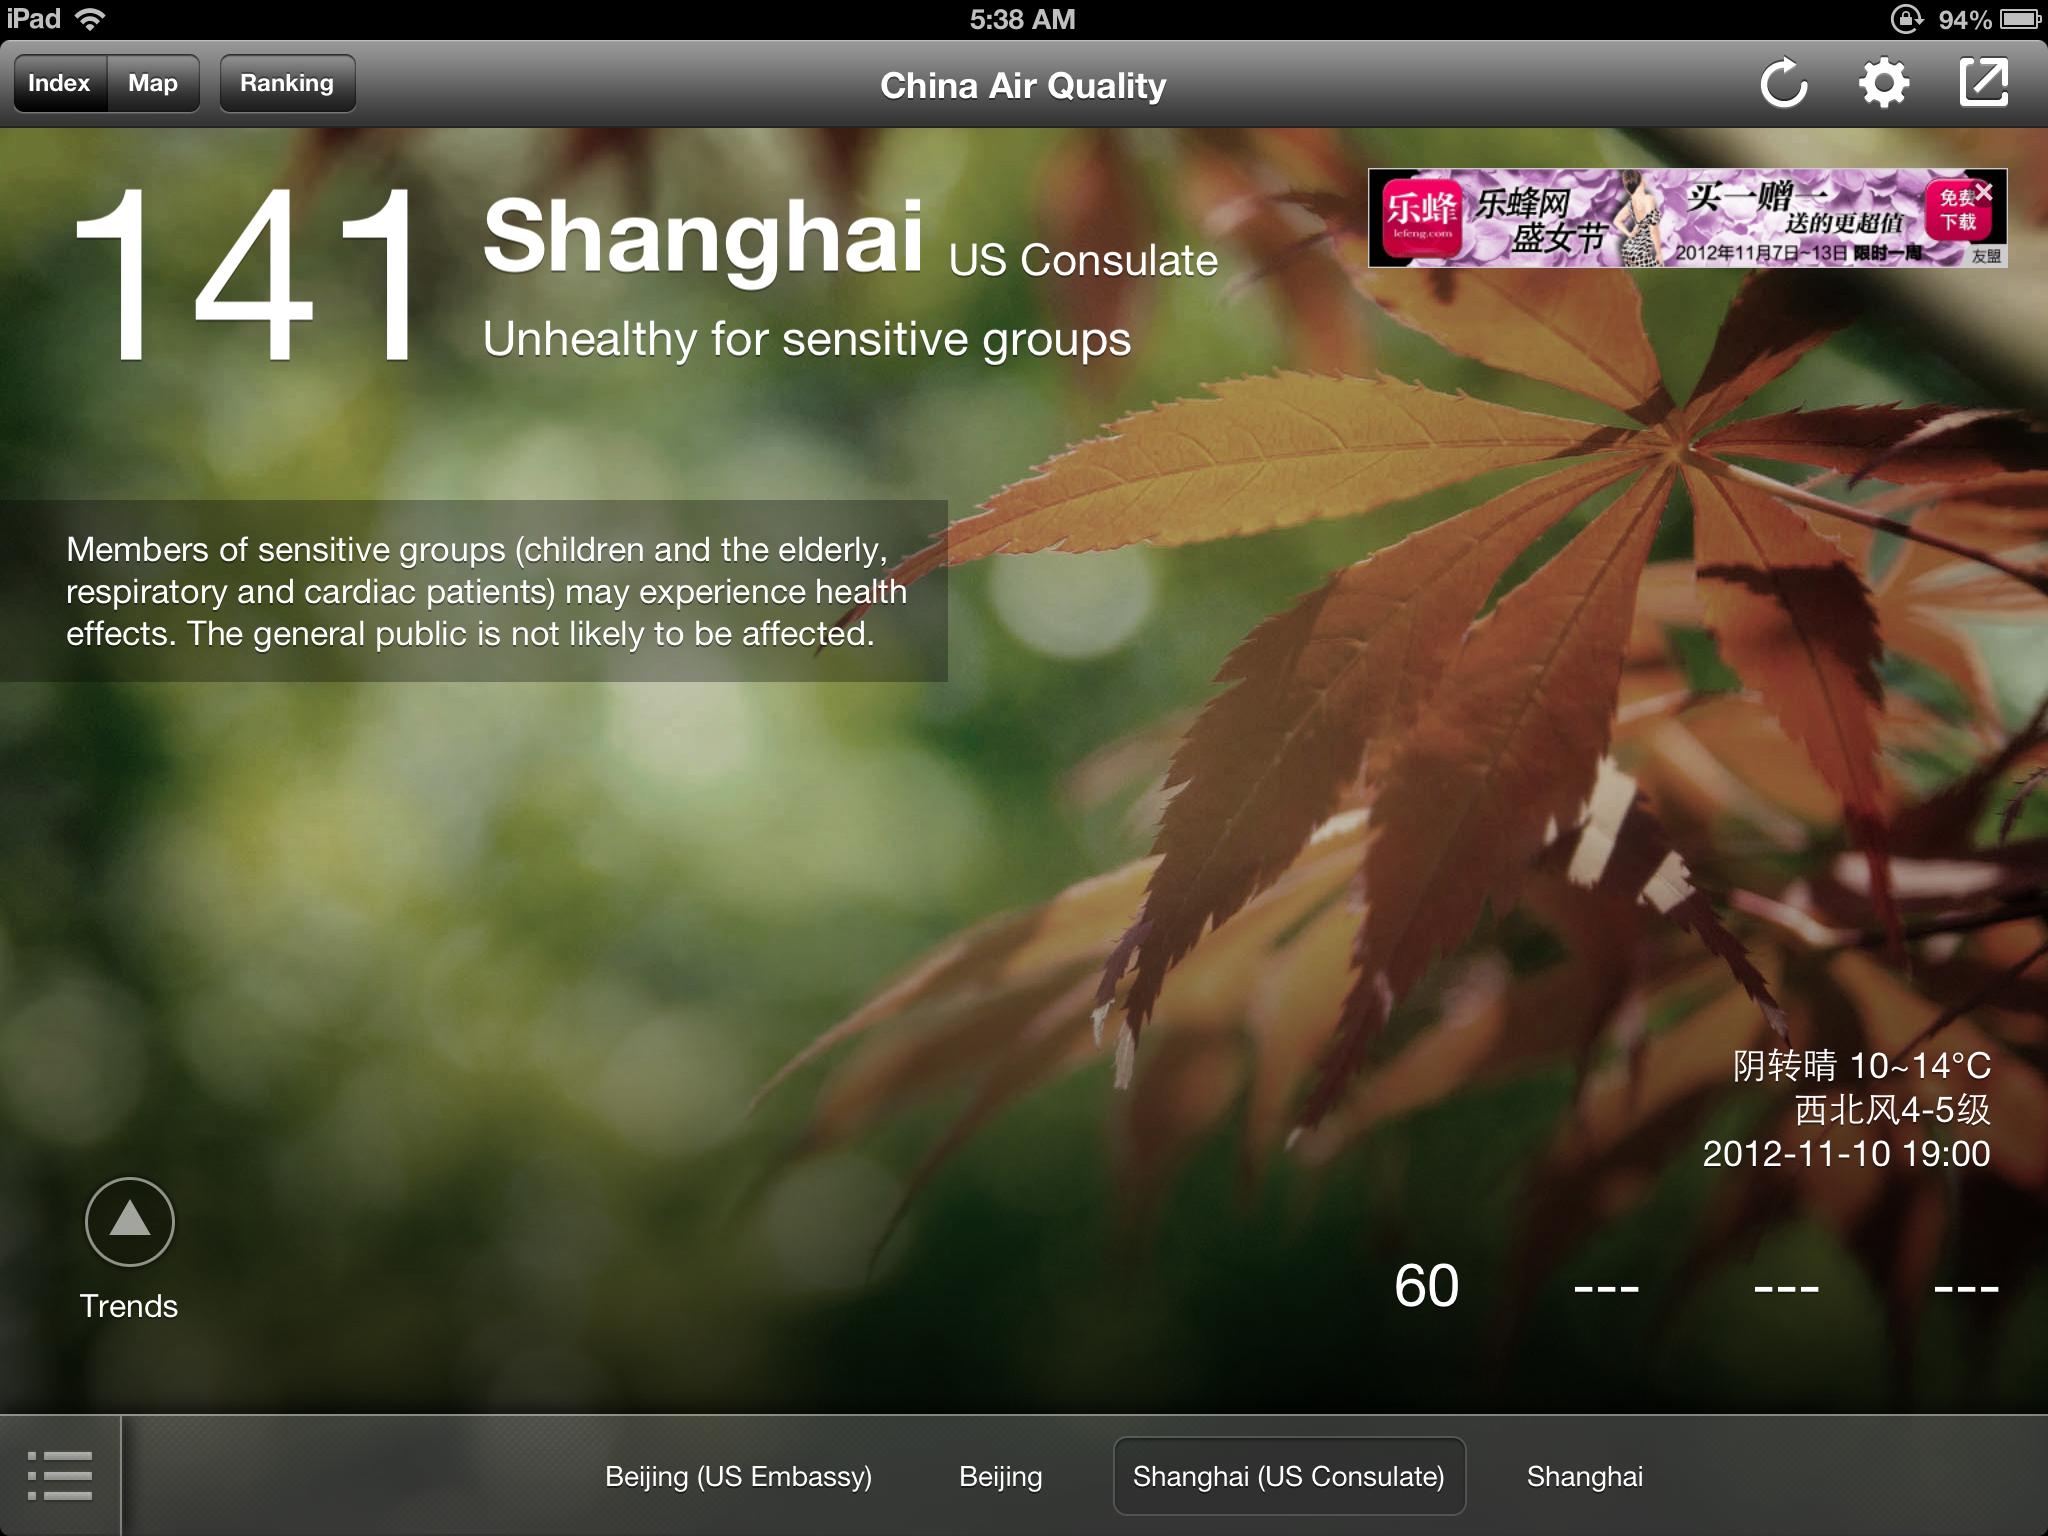 China Air Quality Shanghai - US Consulate